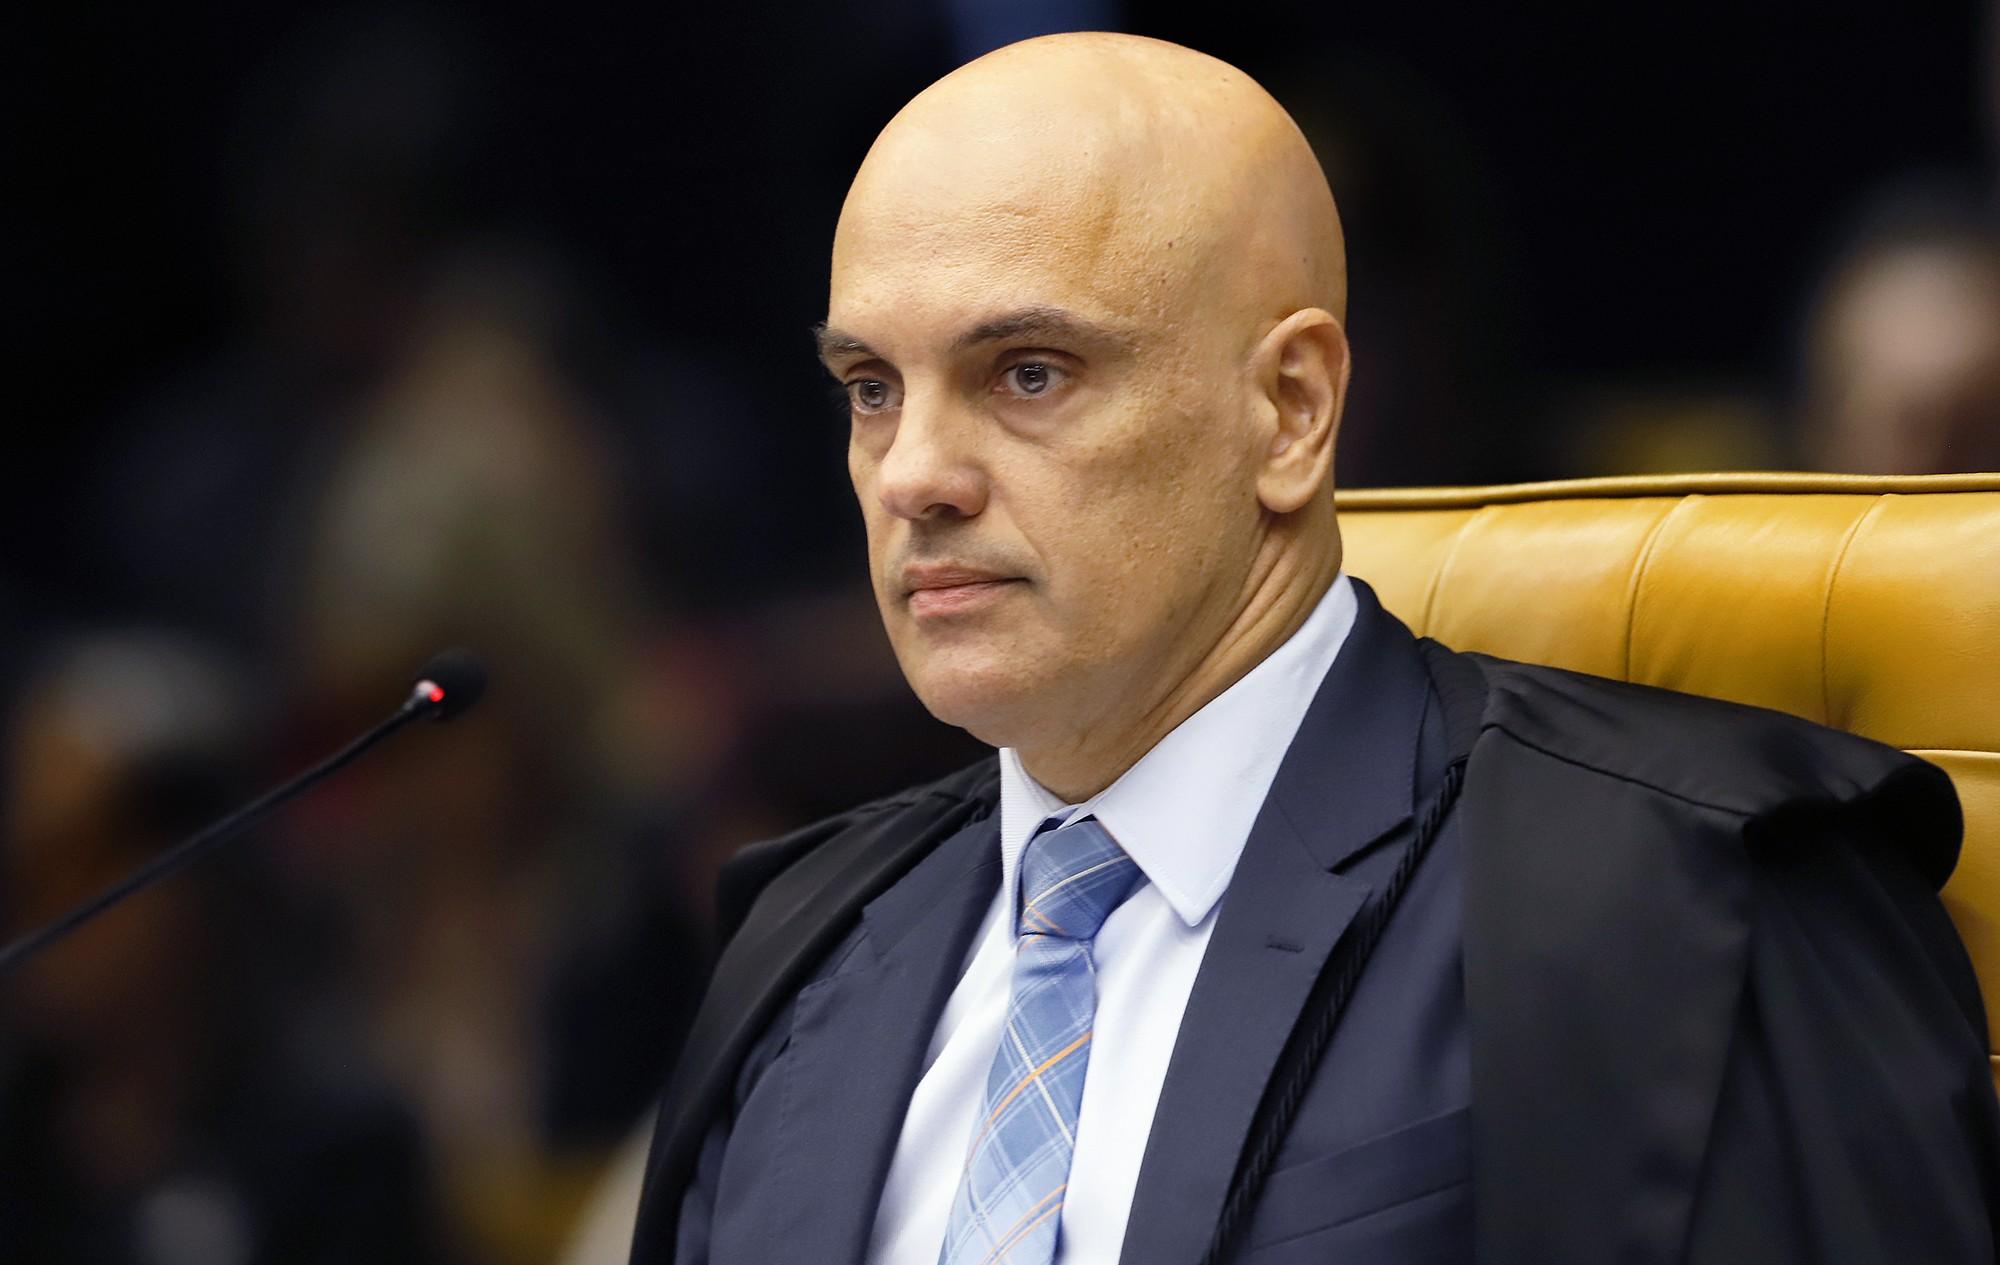 Alexandre de Moraes toma posse como ministro do TSE; Bolsonaro participa por vídeo